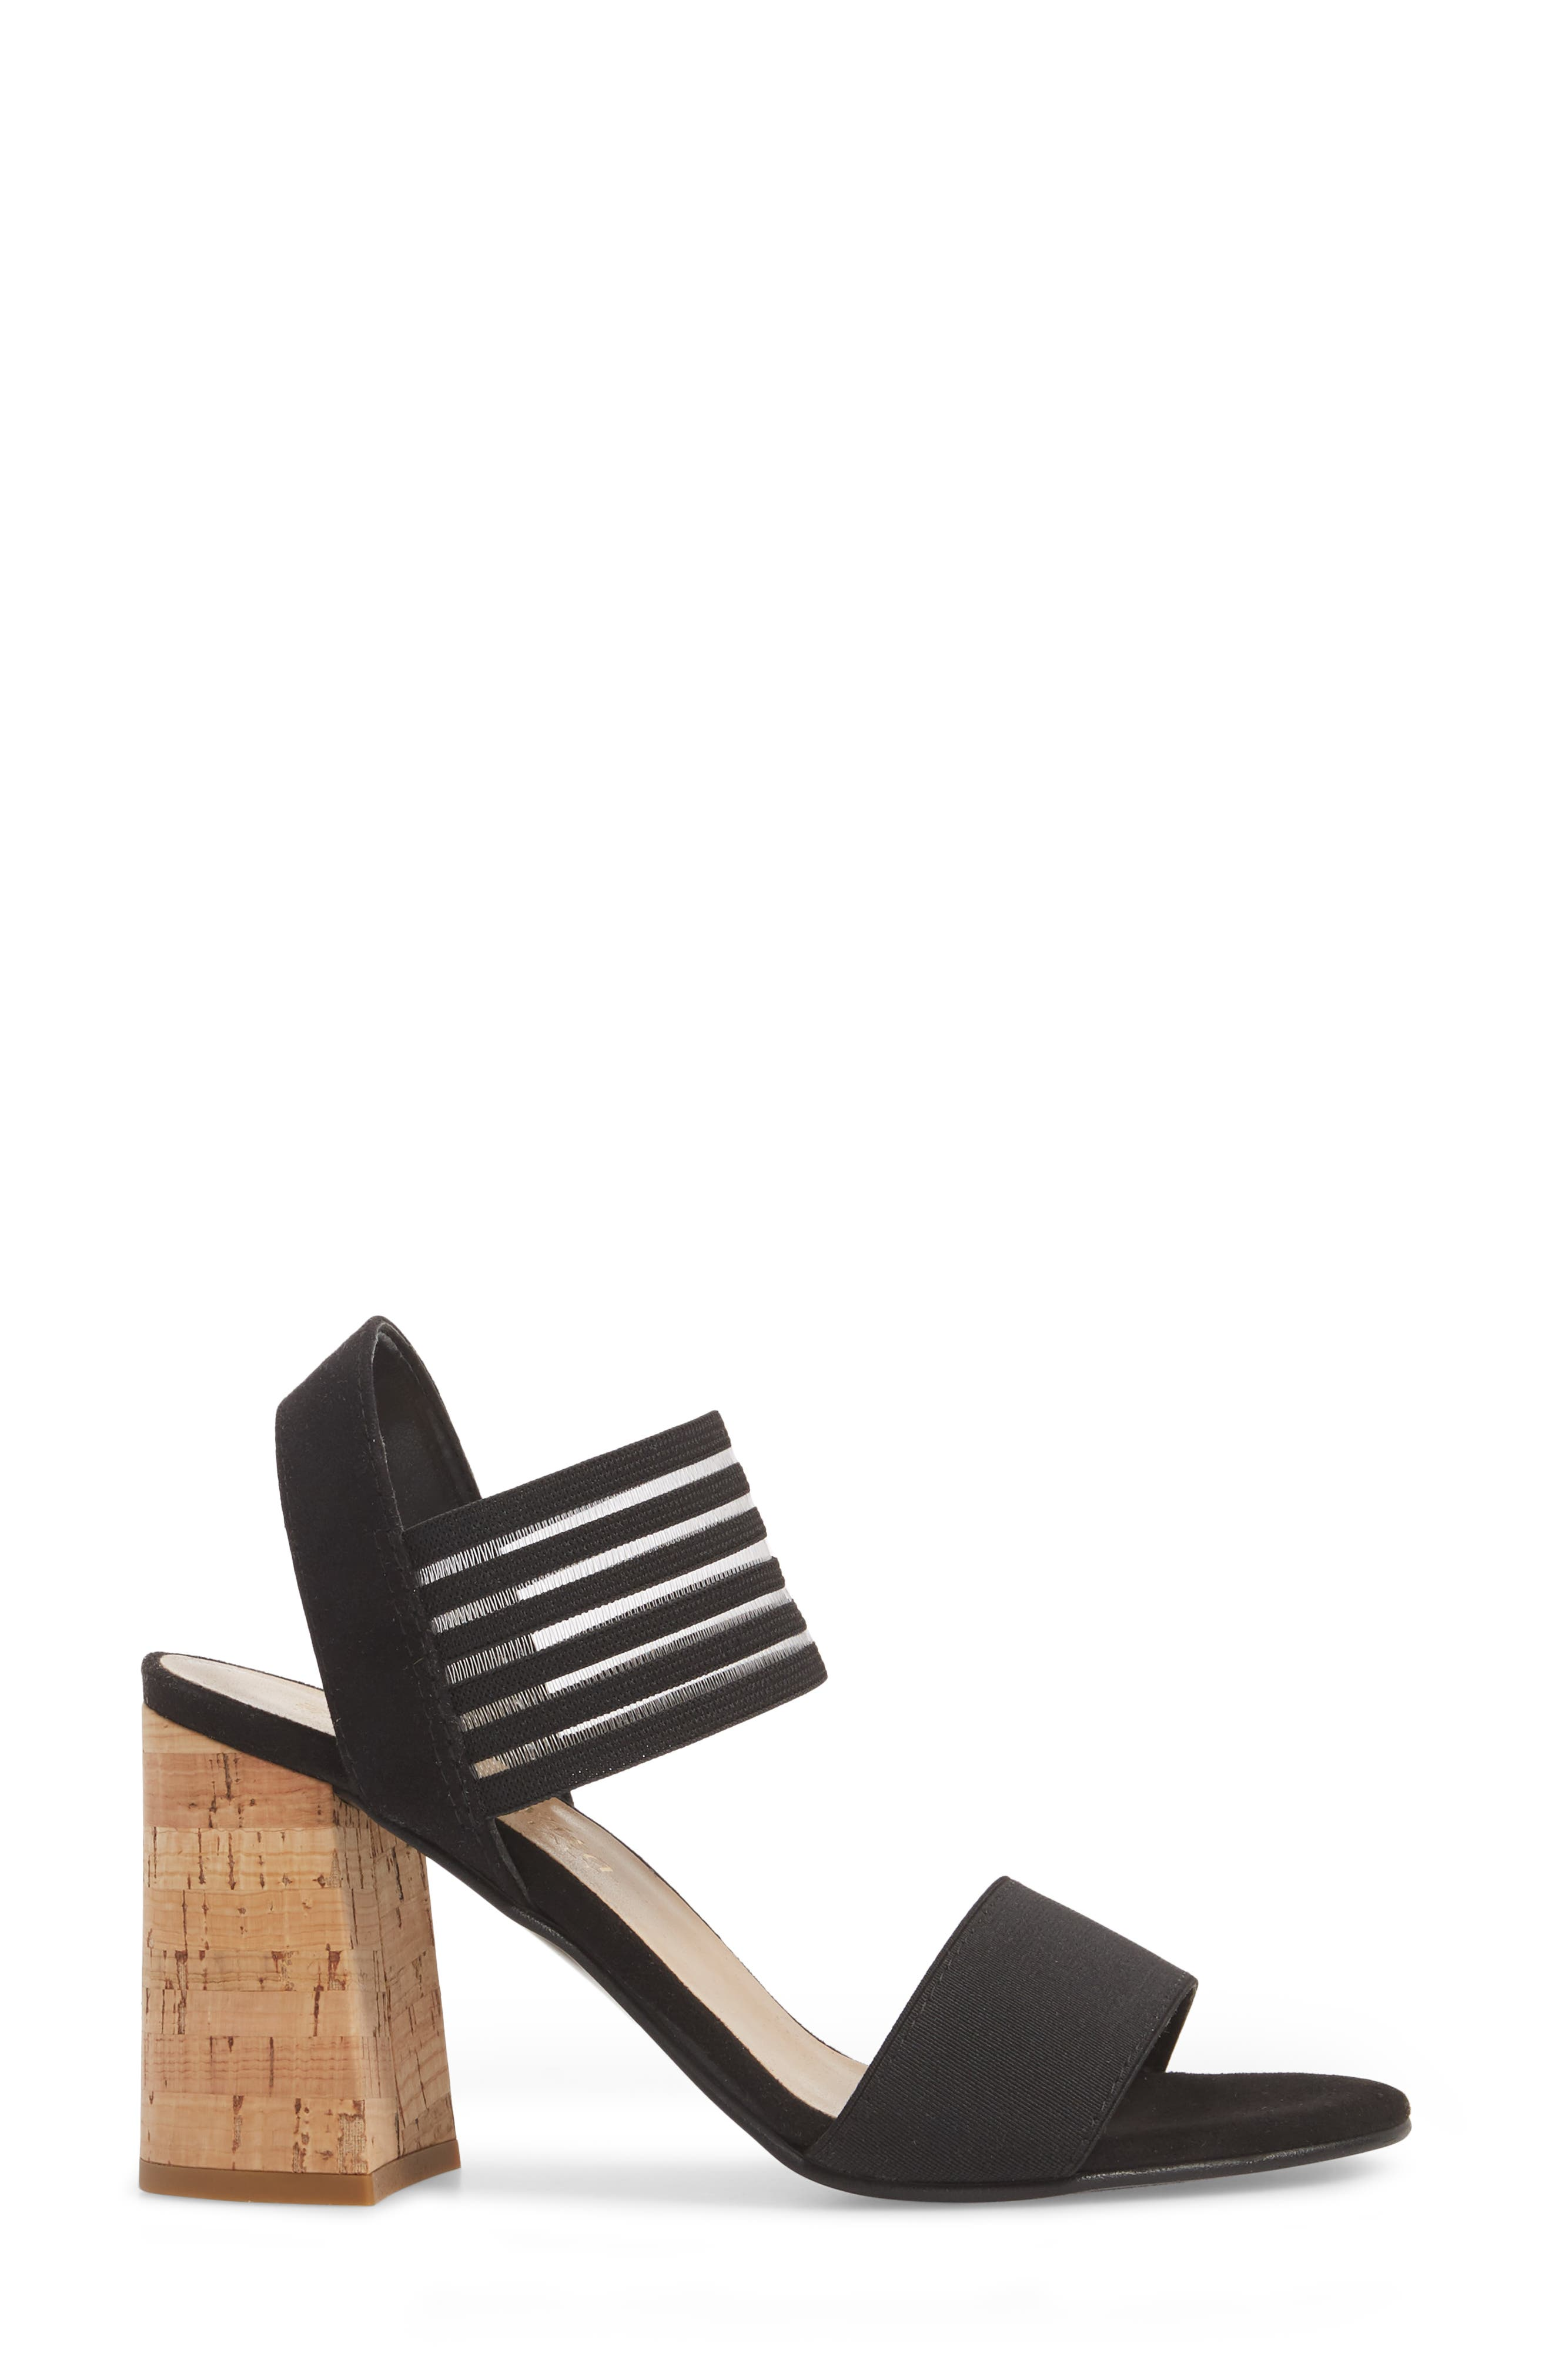 Dan Block Heel Sandal,                             Alternate thumbnail 3, color,                             Black Leather